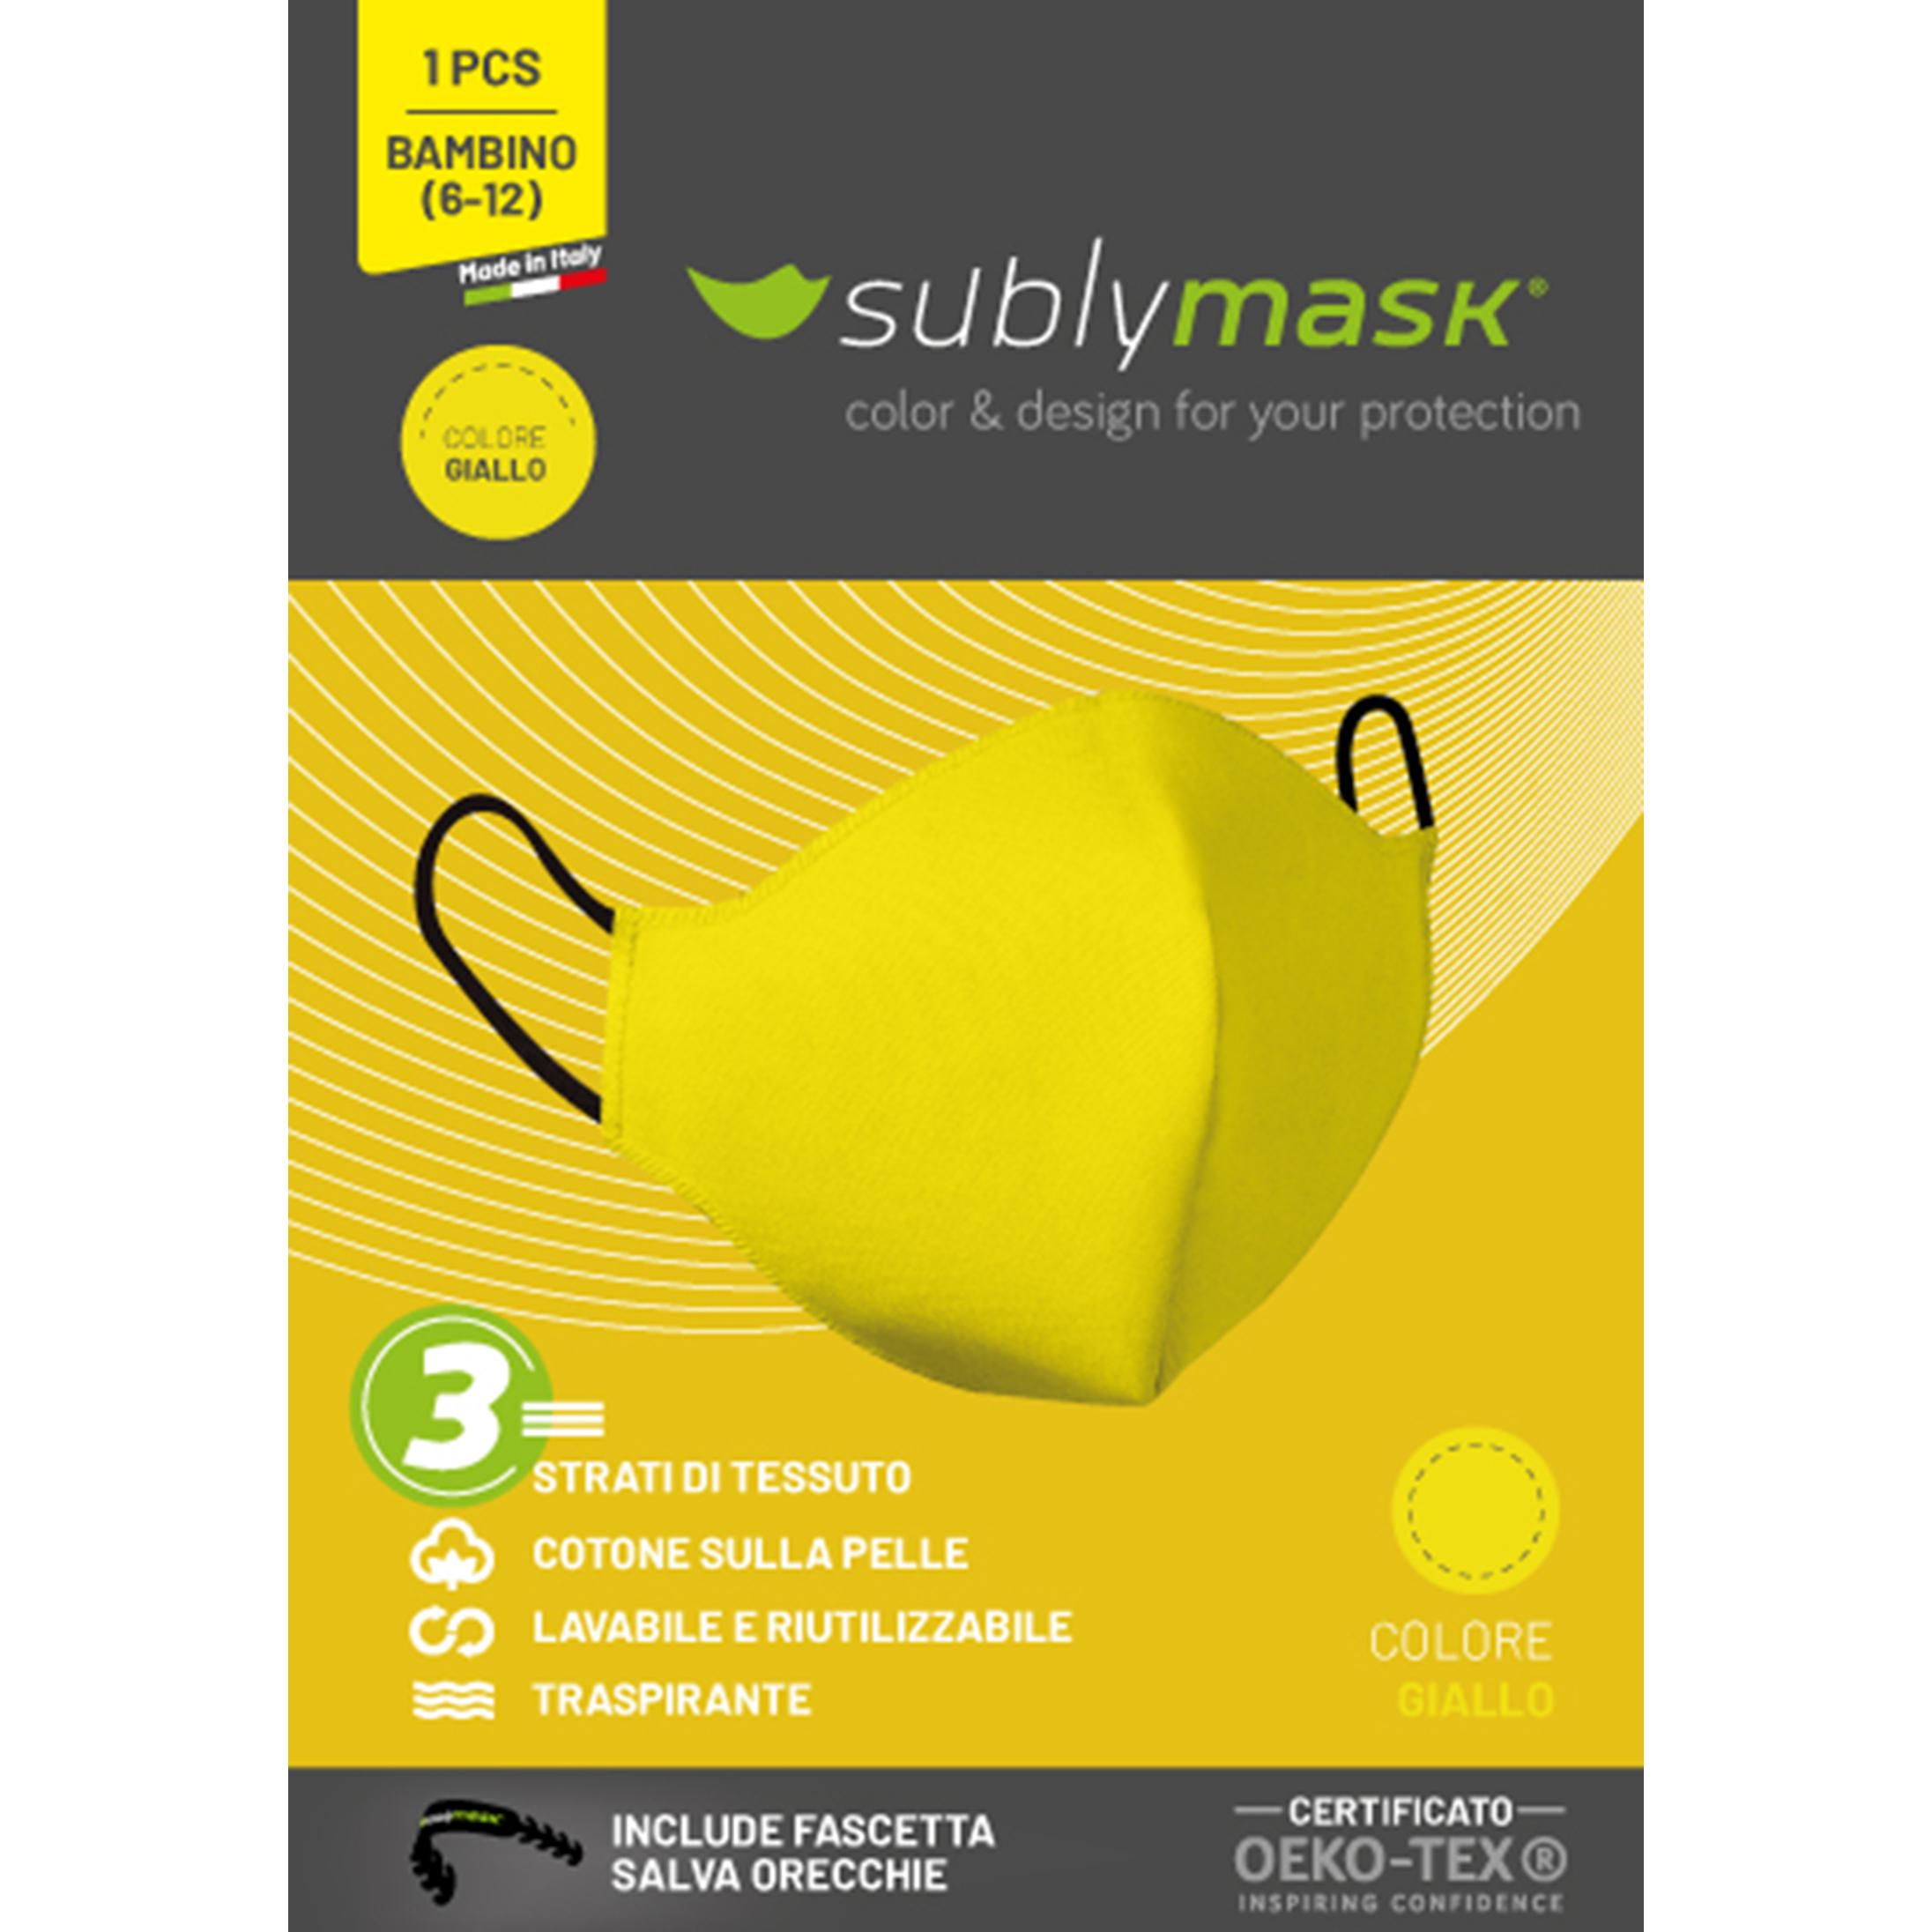 mascherina bambino giallo2